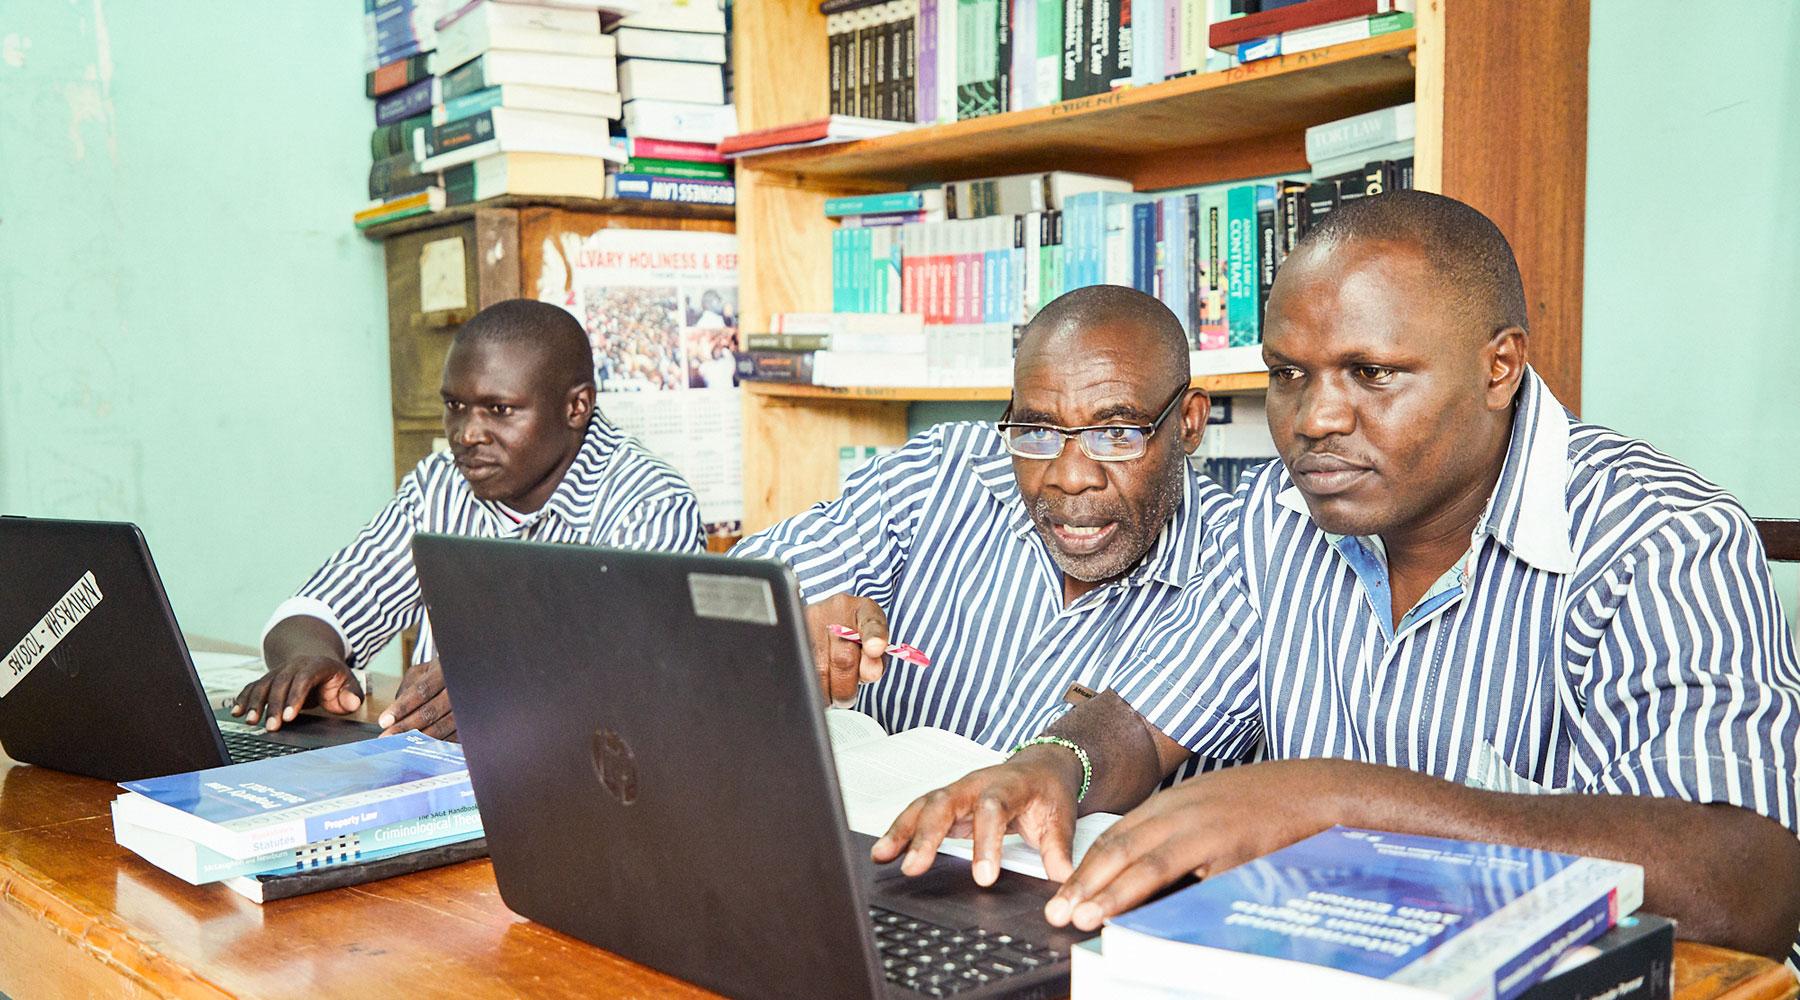 Peer educators and paralegals working a case at Naivasha Maximum Prison, Kenya.